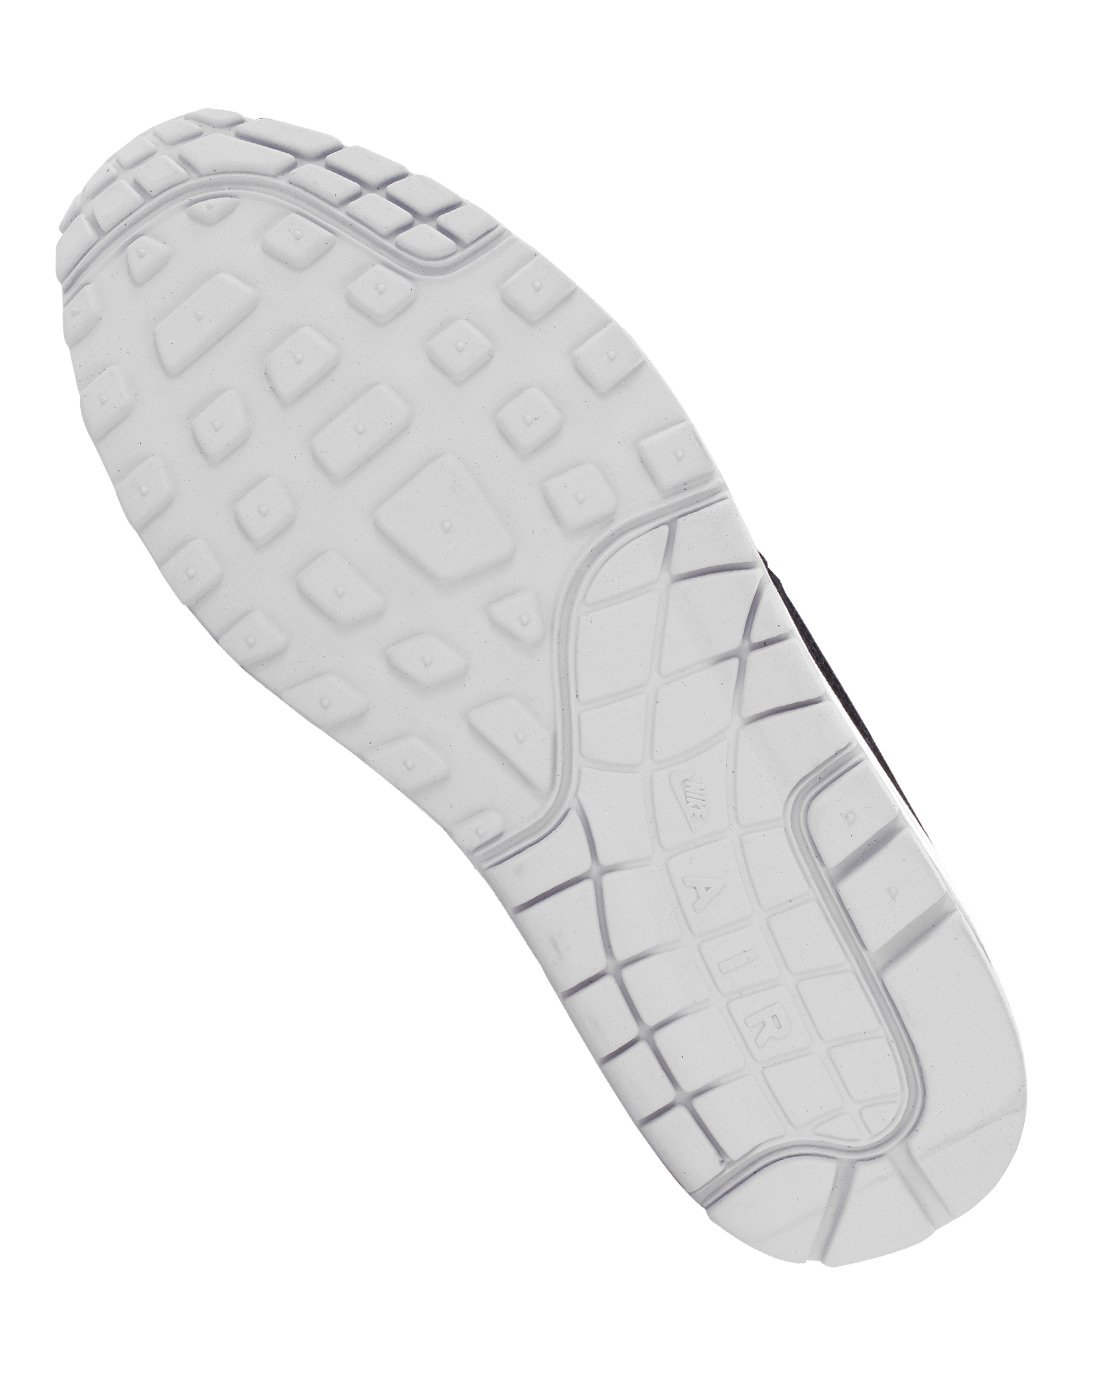 Nike AIR MAX 1 ACG Pack art. 308866 020 Size:US 9.5 EUR 43